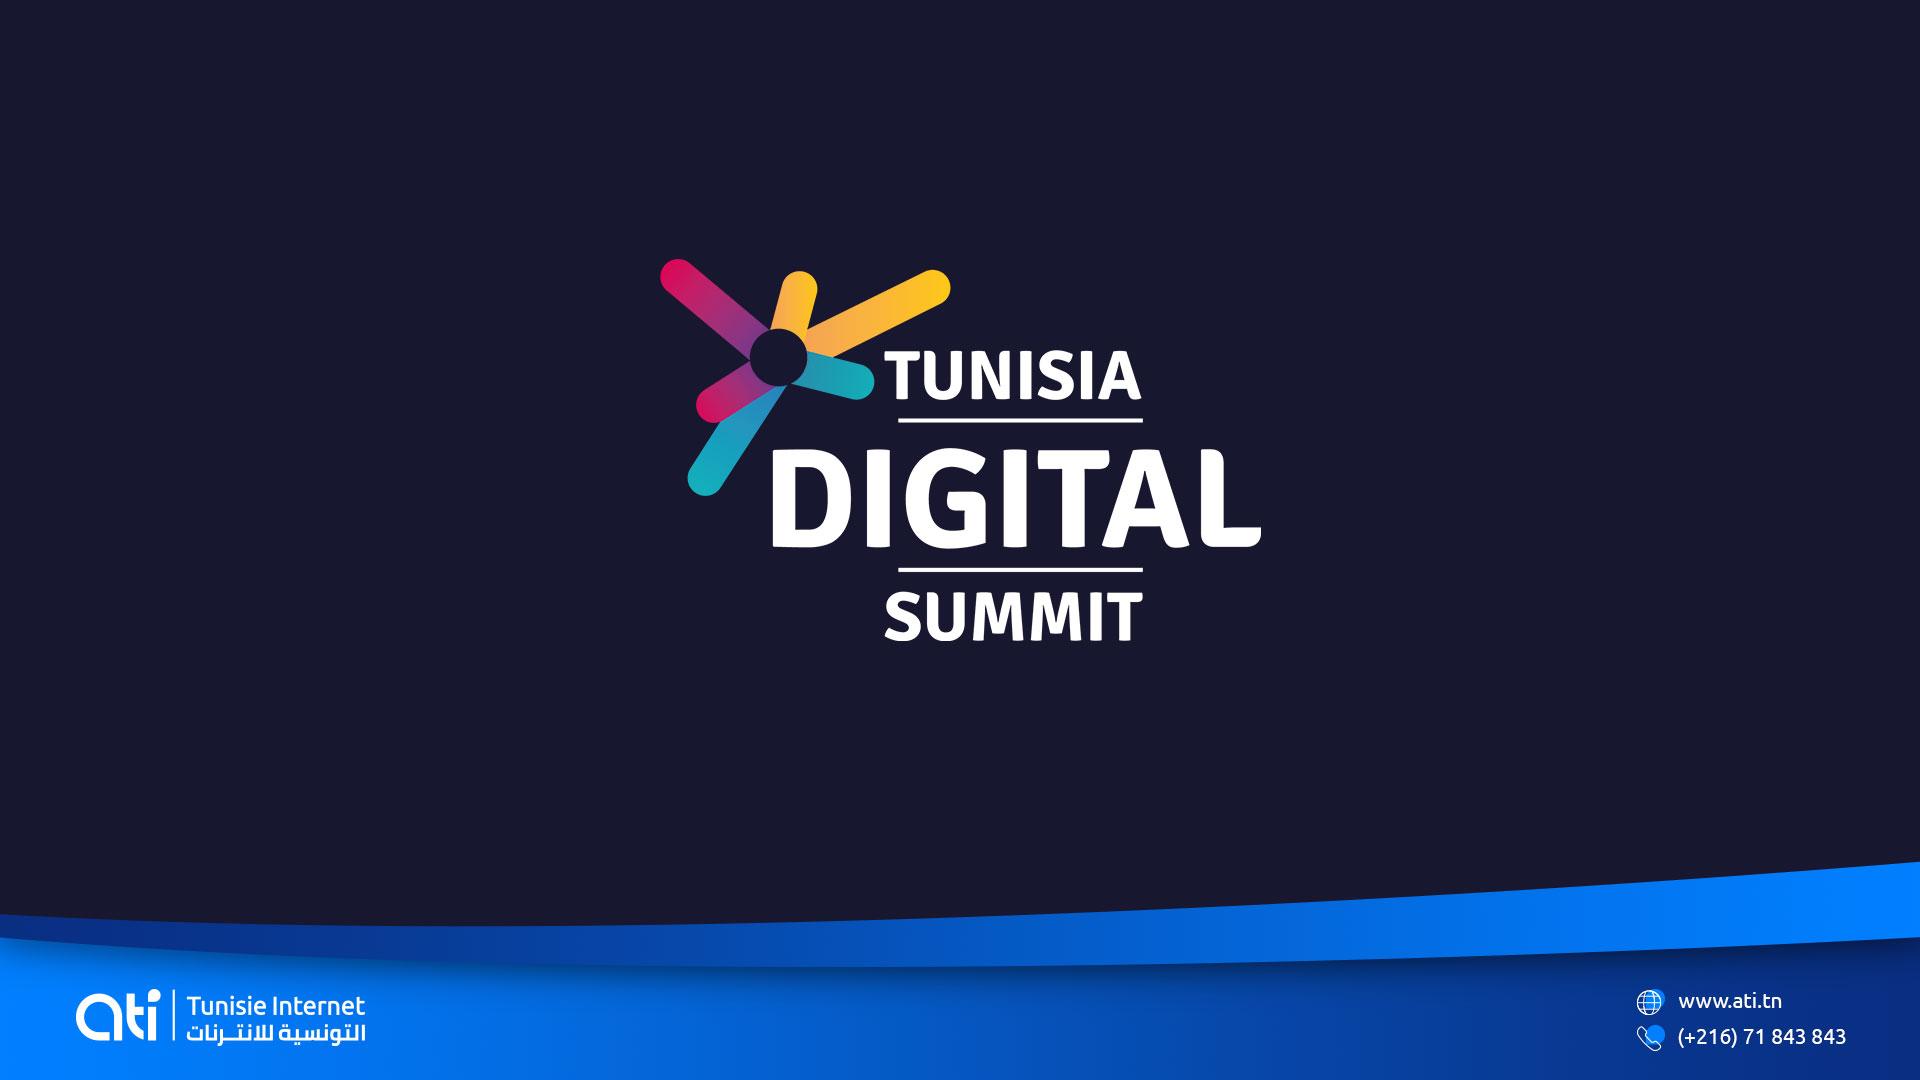 Démarrage à Tunis du Tunisia Digital Summit